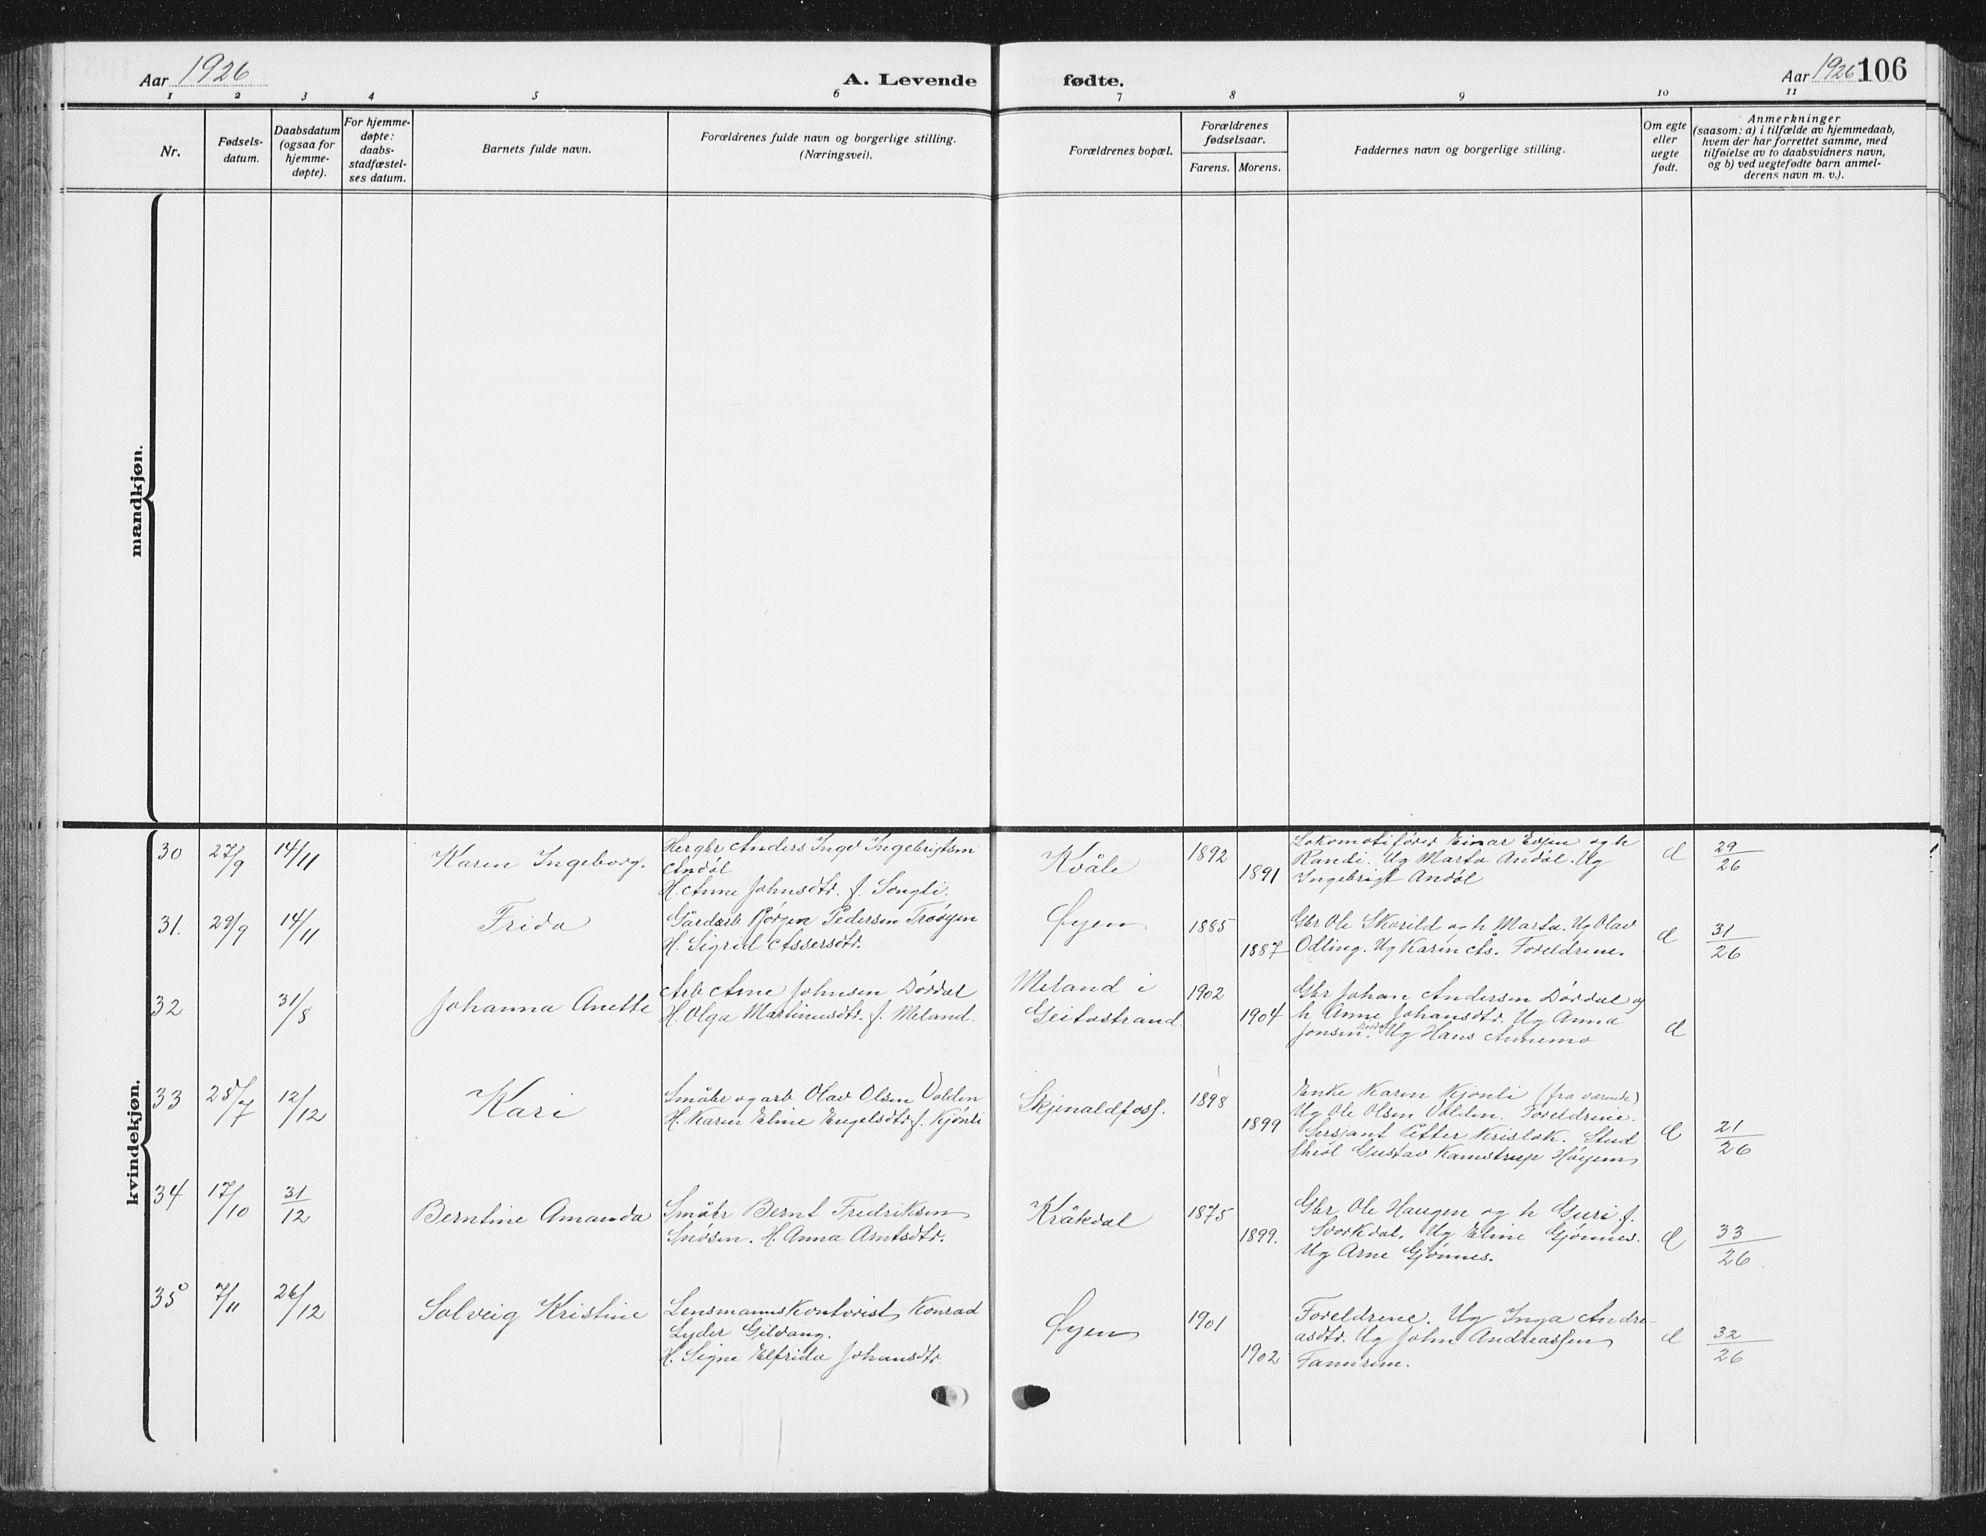 SAT, Ministerialprotokoller, klokkerbøker og fødselsregistre - Sør-Trøndelag, 668/L0820: Parish register (copy) no. 668C09, 1912-1936, p. 106